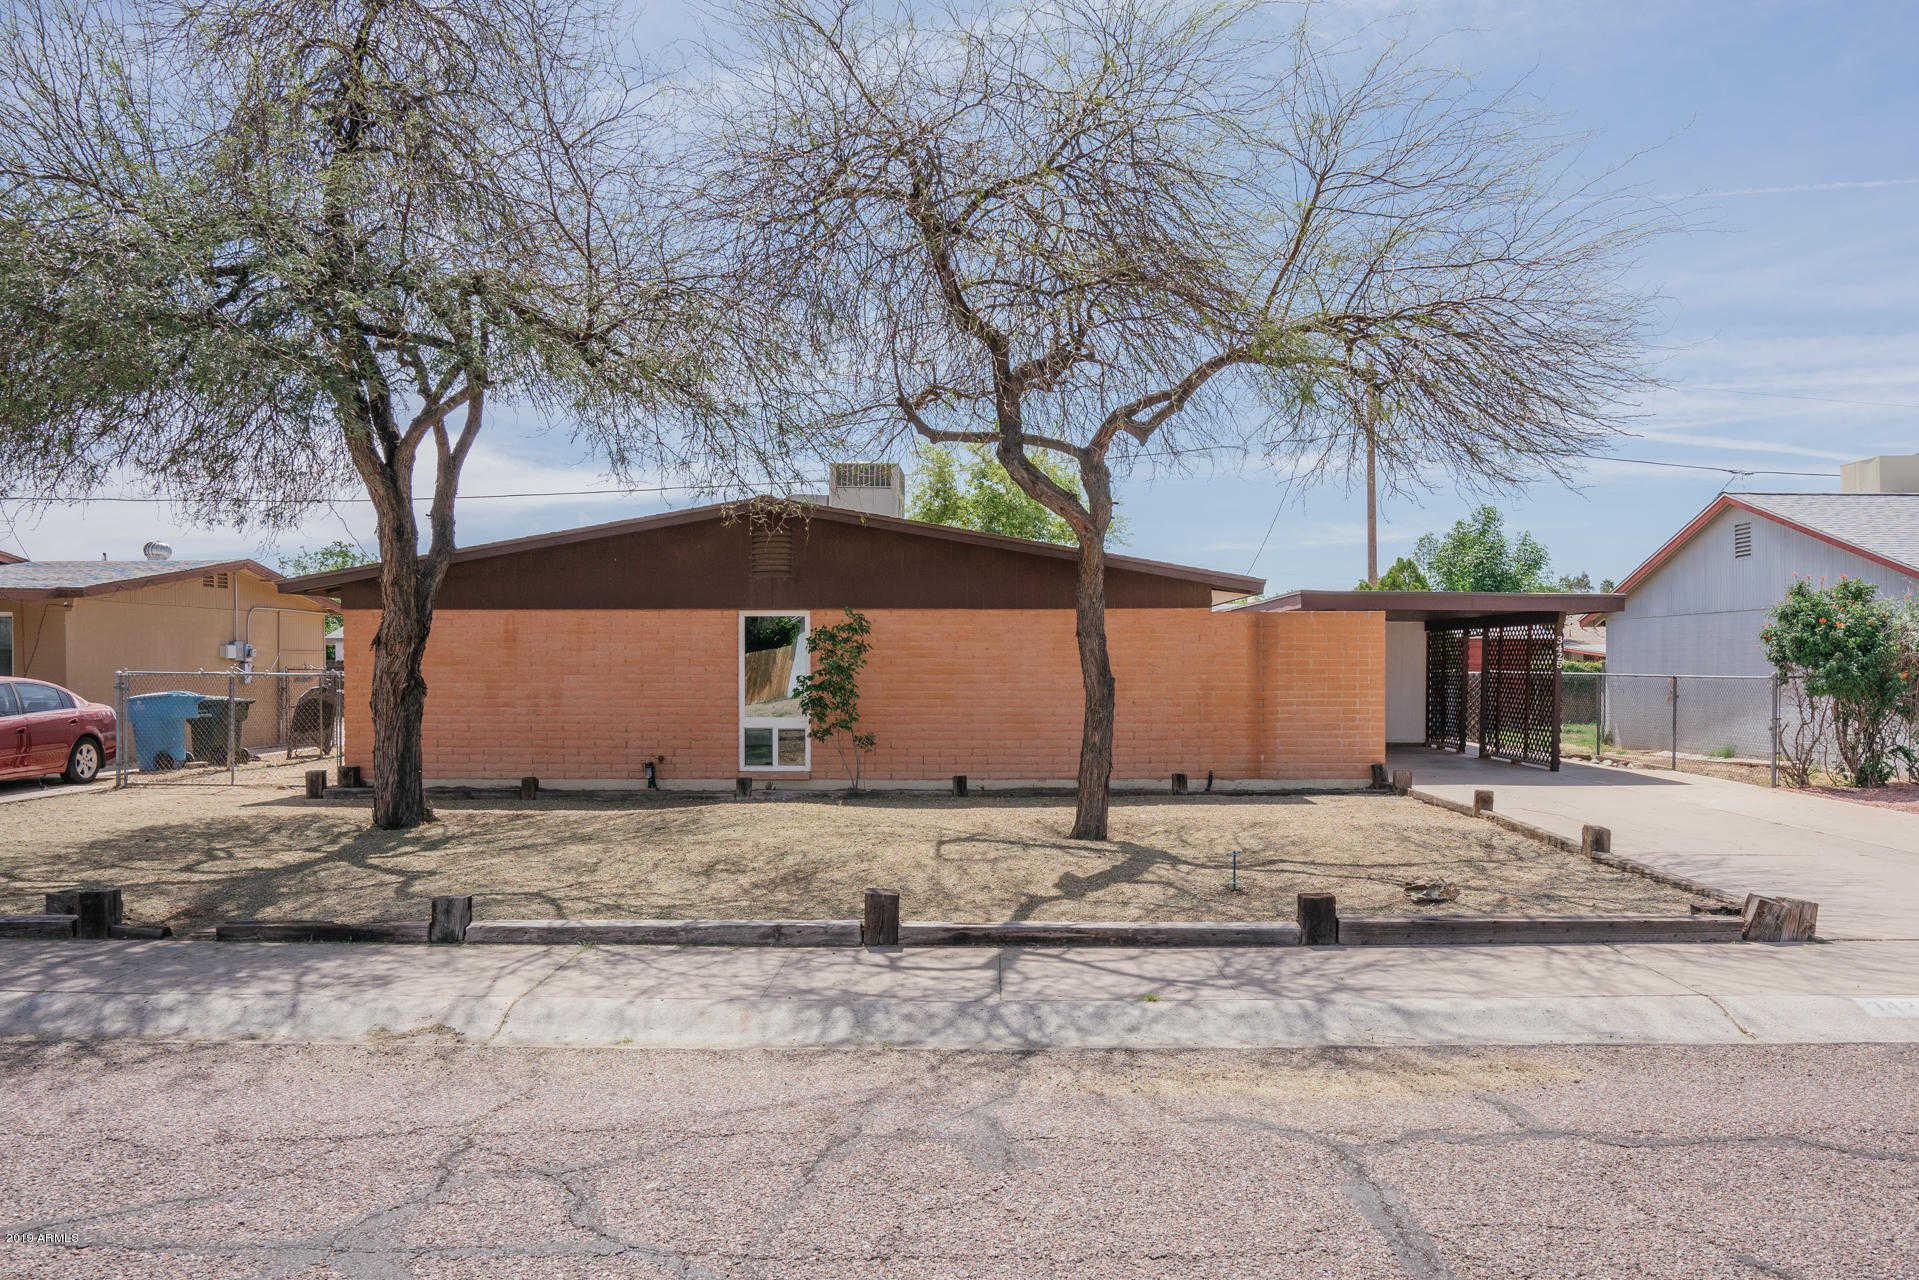 $200,000 - 3Br/2Ba - Home for Sale in Westown 6 Lot 1085-1241 & Tr C, Phoenix